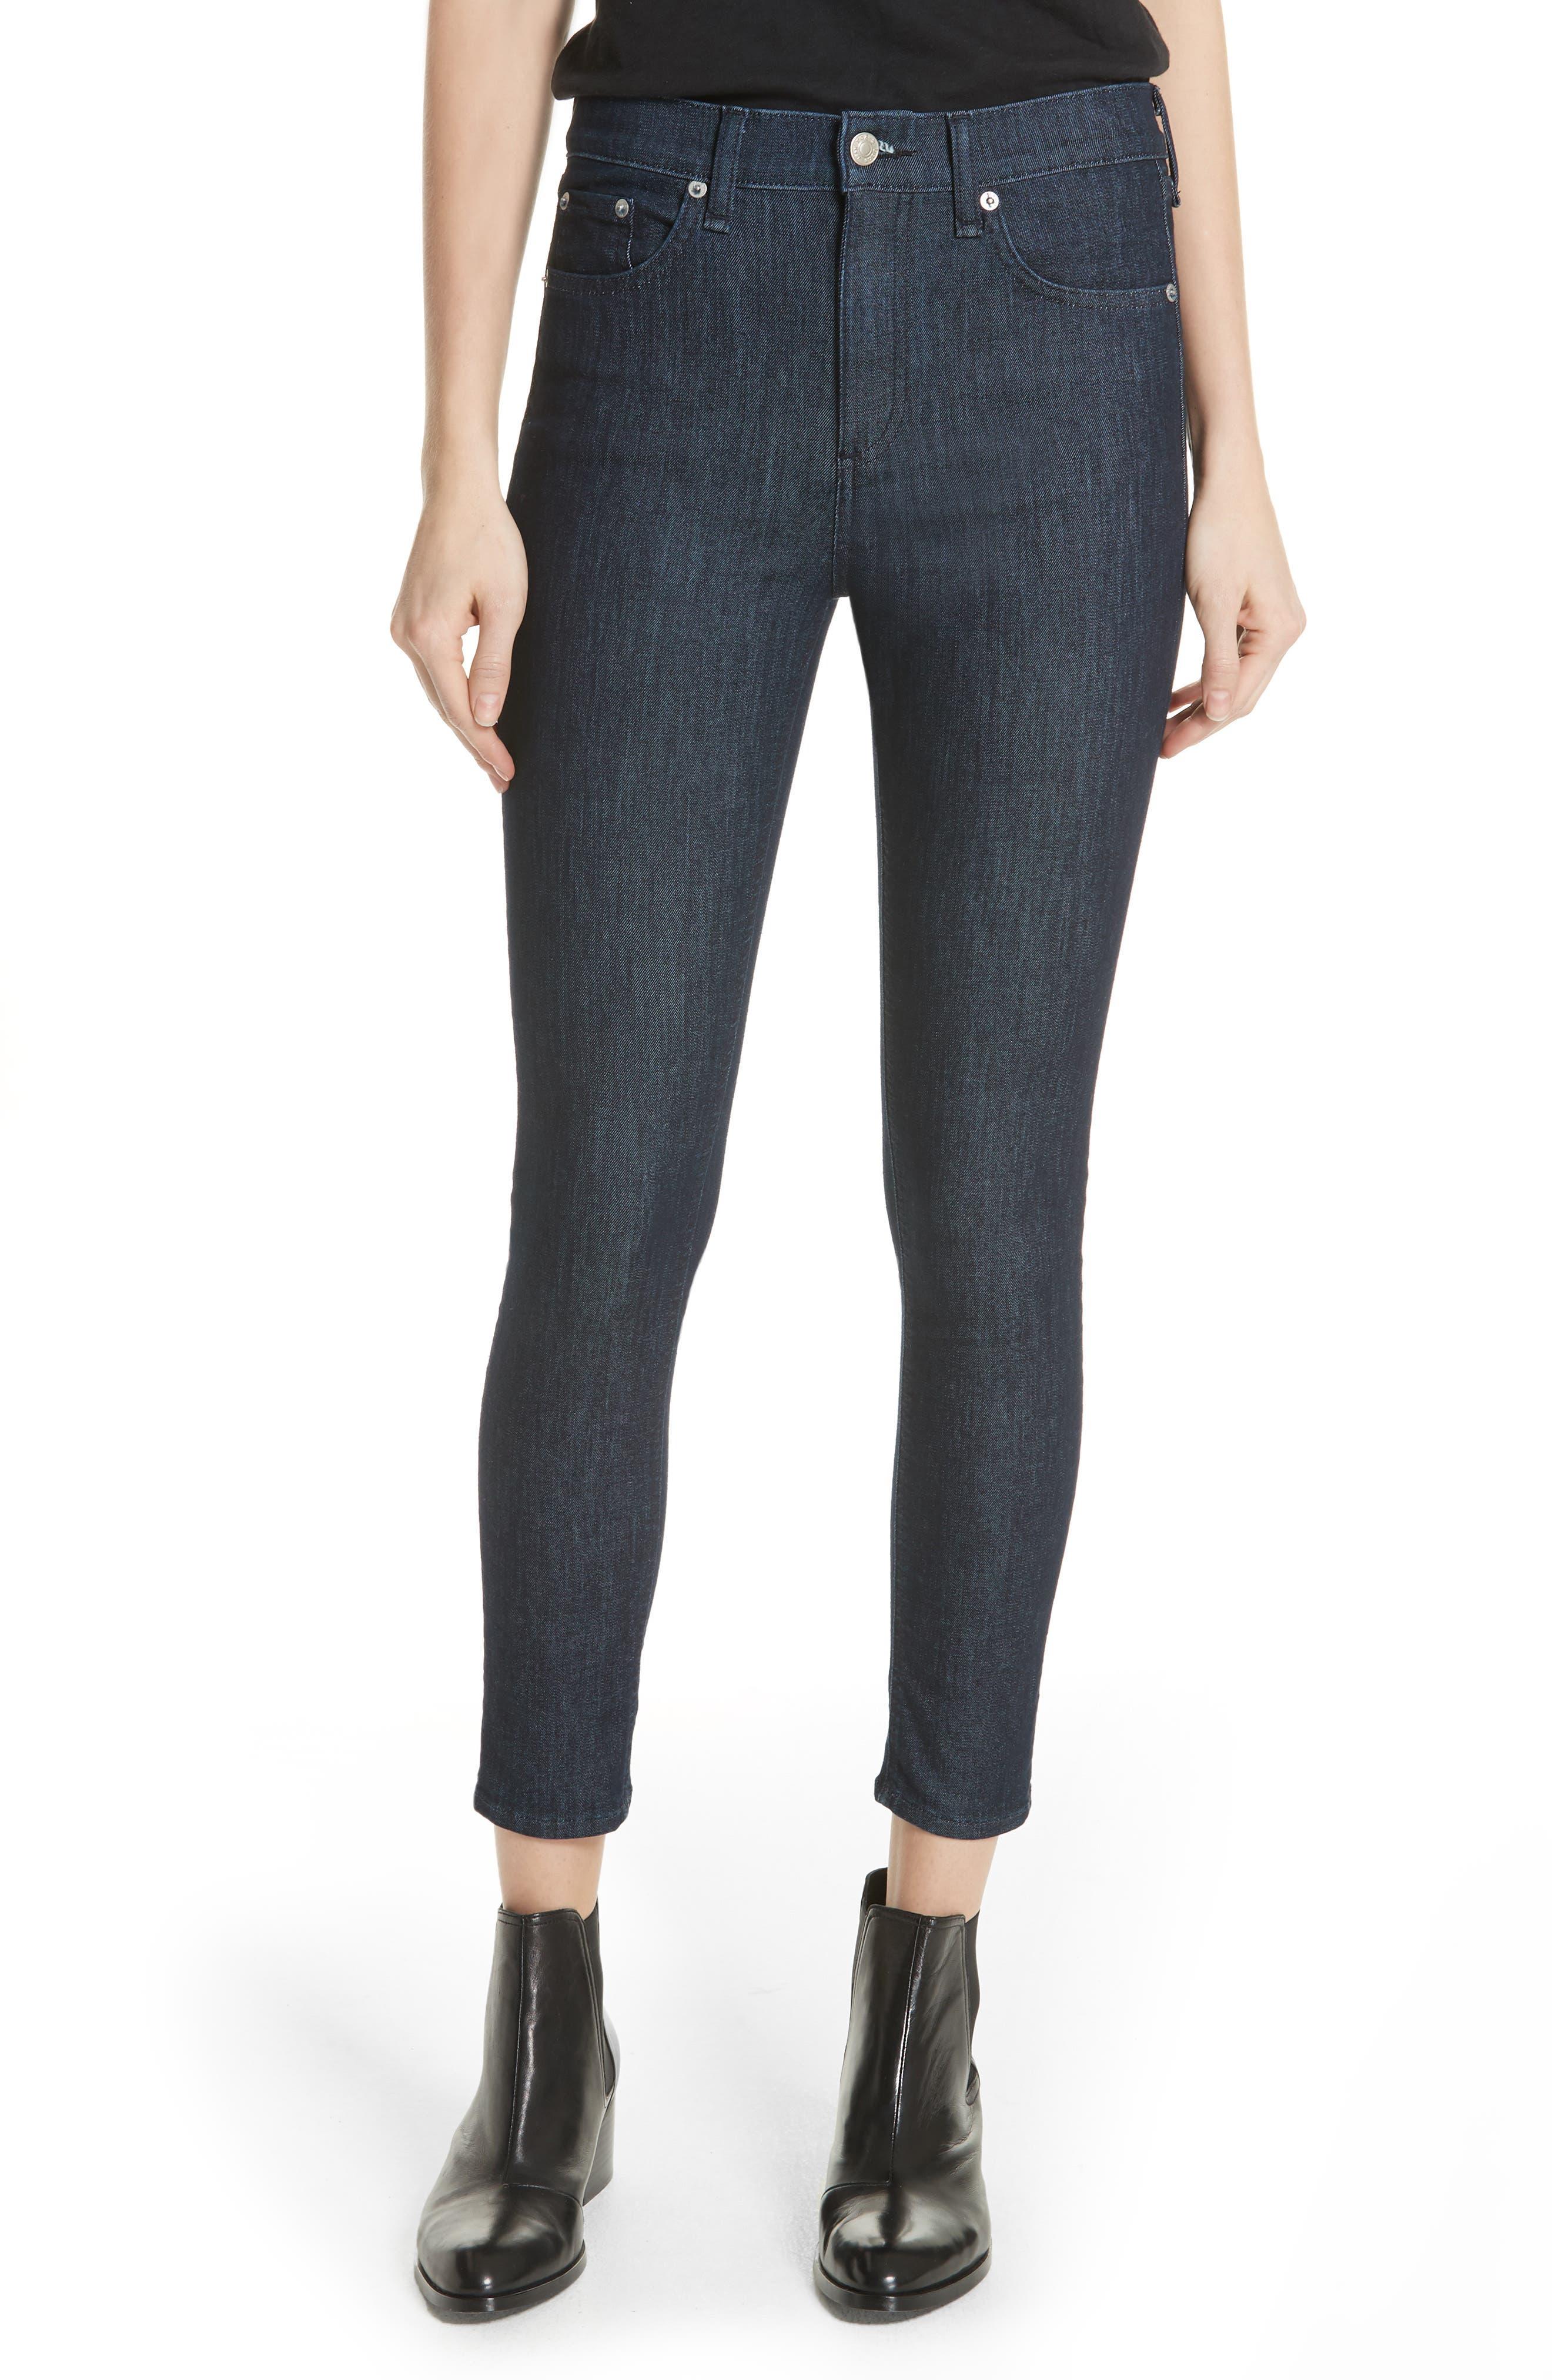 RAG & BONE, High Waist Skinny Jeans, Main thumbnail 1, color, INDIGO